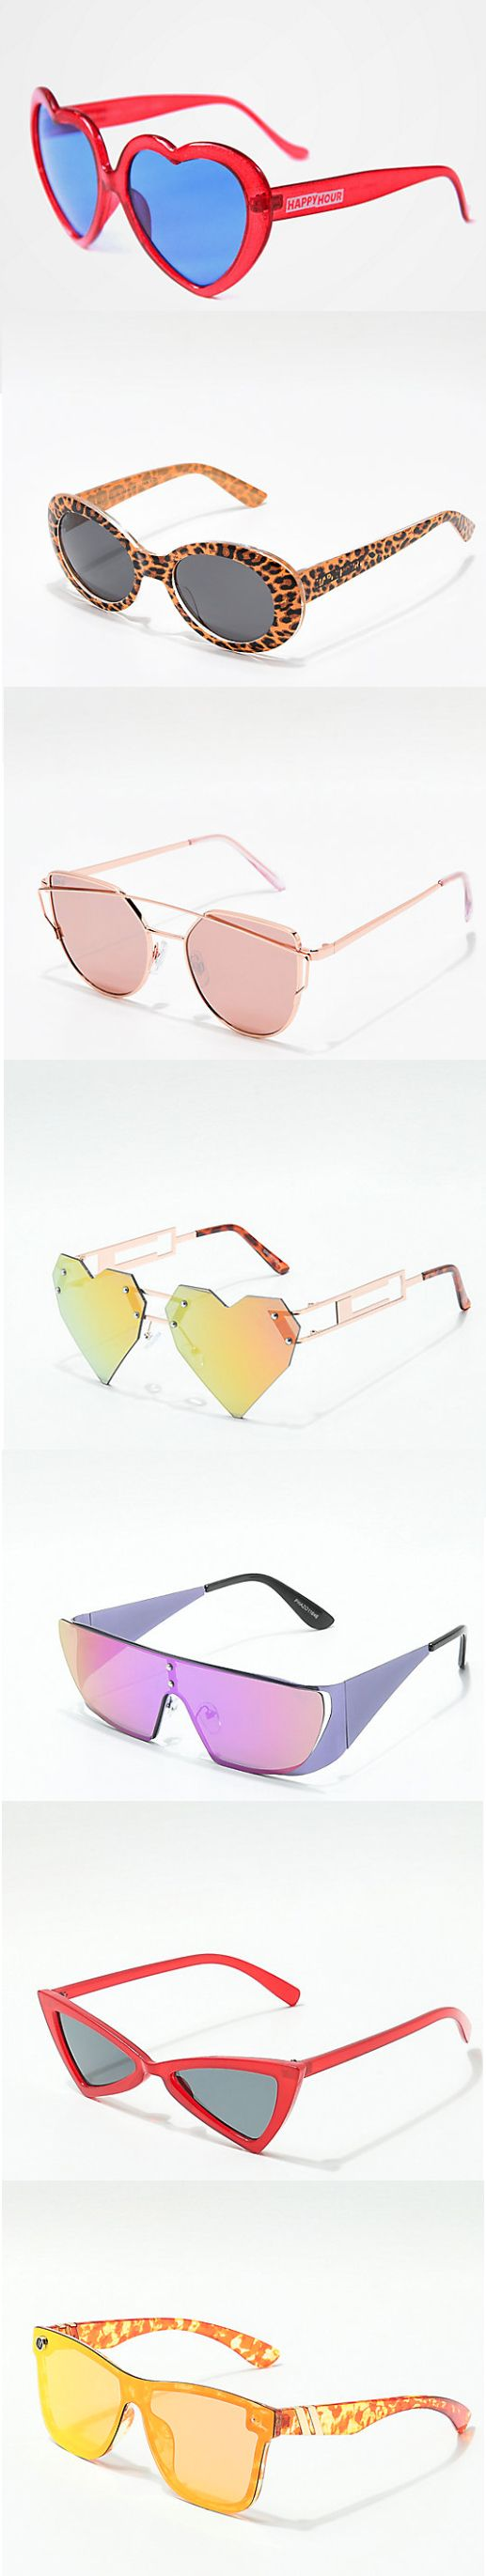 134c7da2f65 Electric Sunglasses Knoxville Rasta « One More Soul